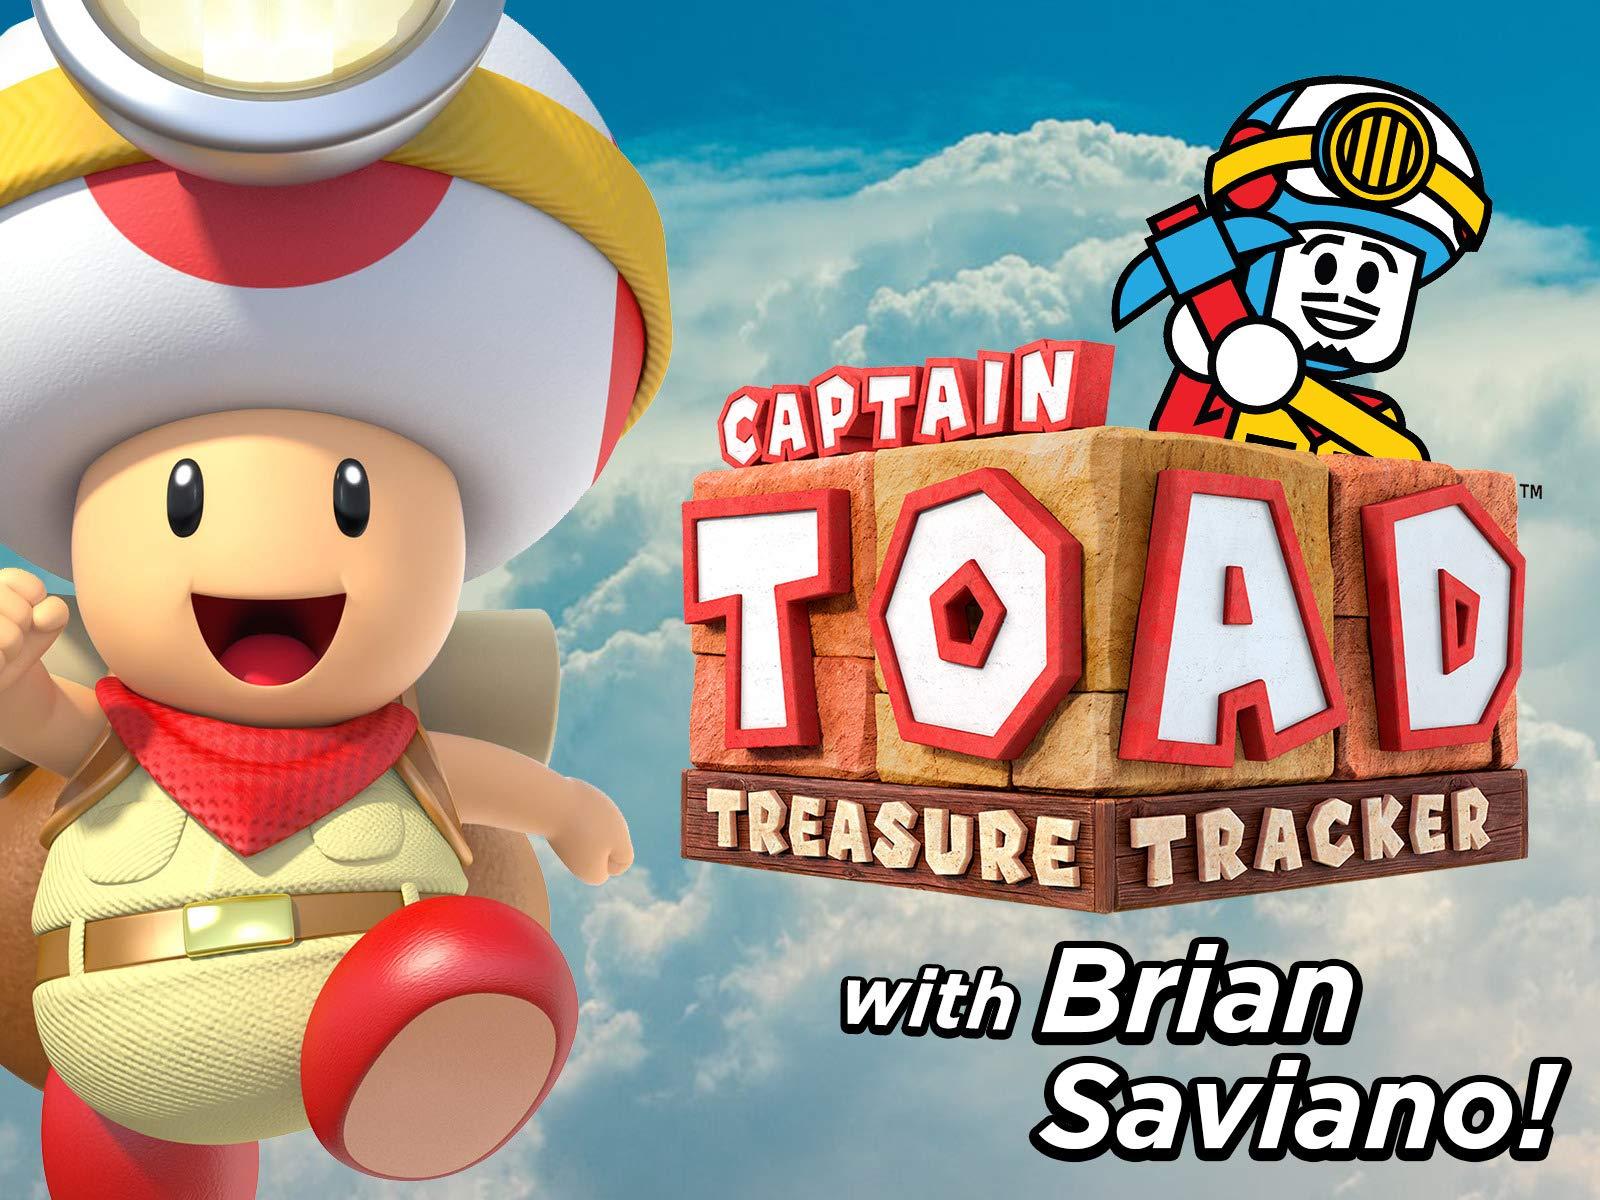 Clip: Captain Toad Treasure Tracker with Brian Saviano! - Season 1